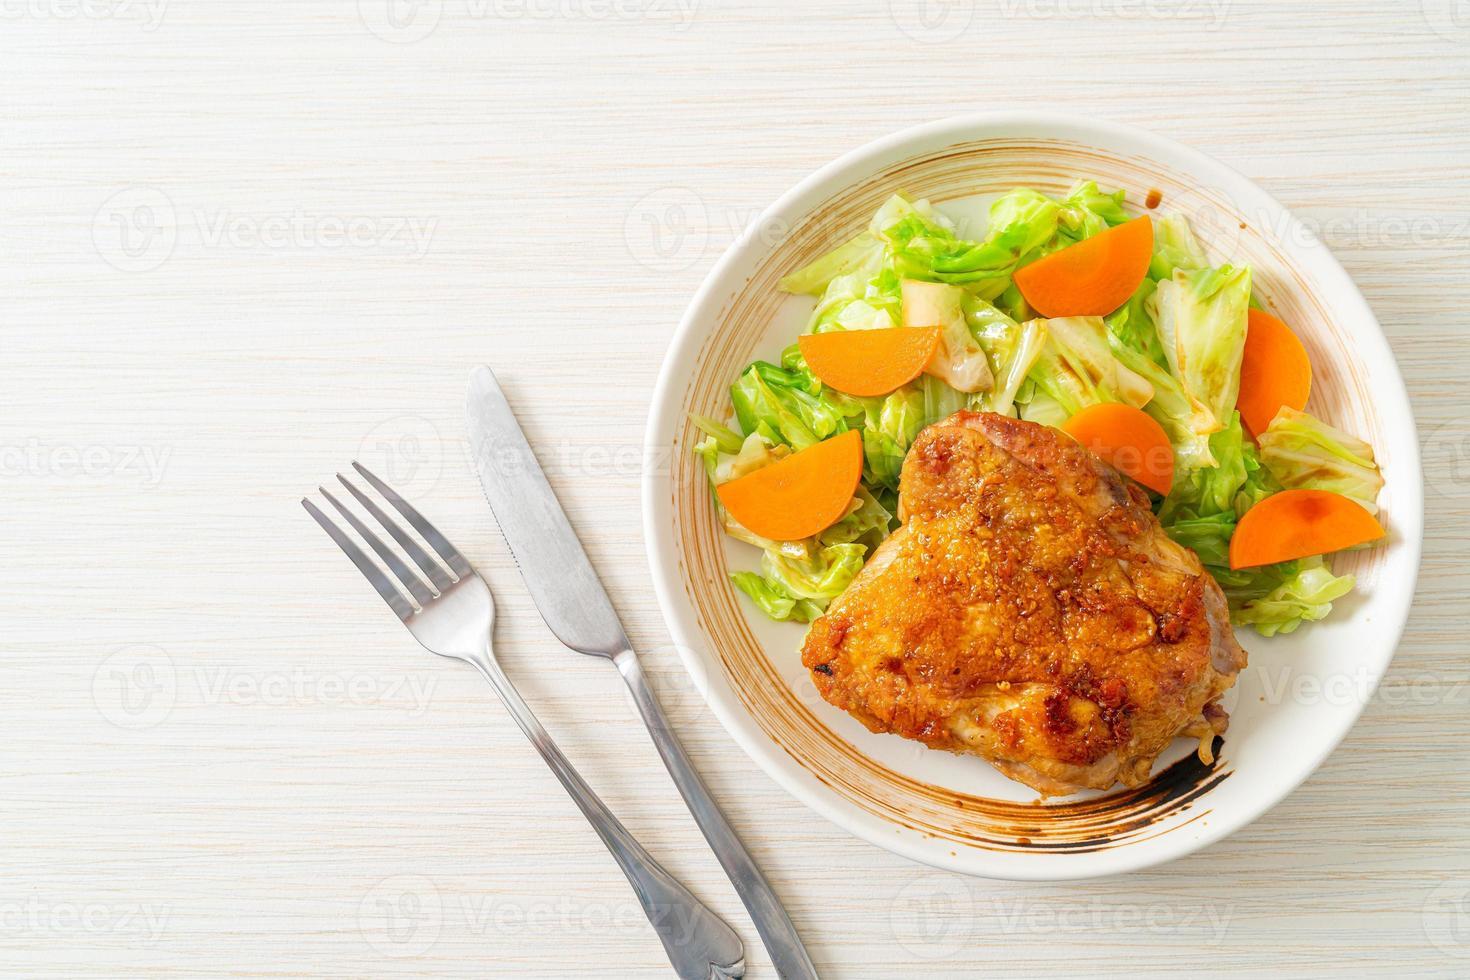 Teppanyaki teriyaki chicken steak with cabbage and carrot photo